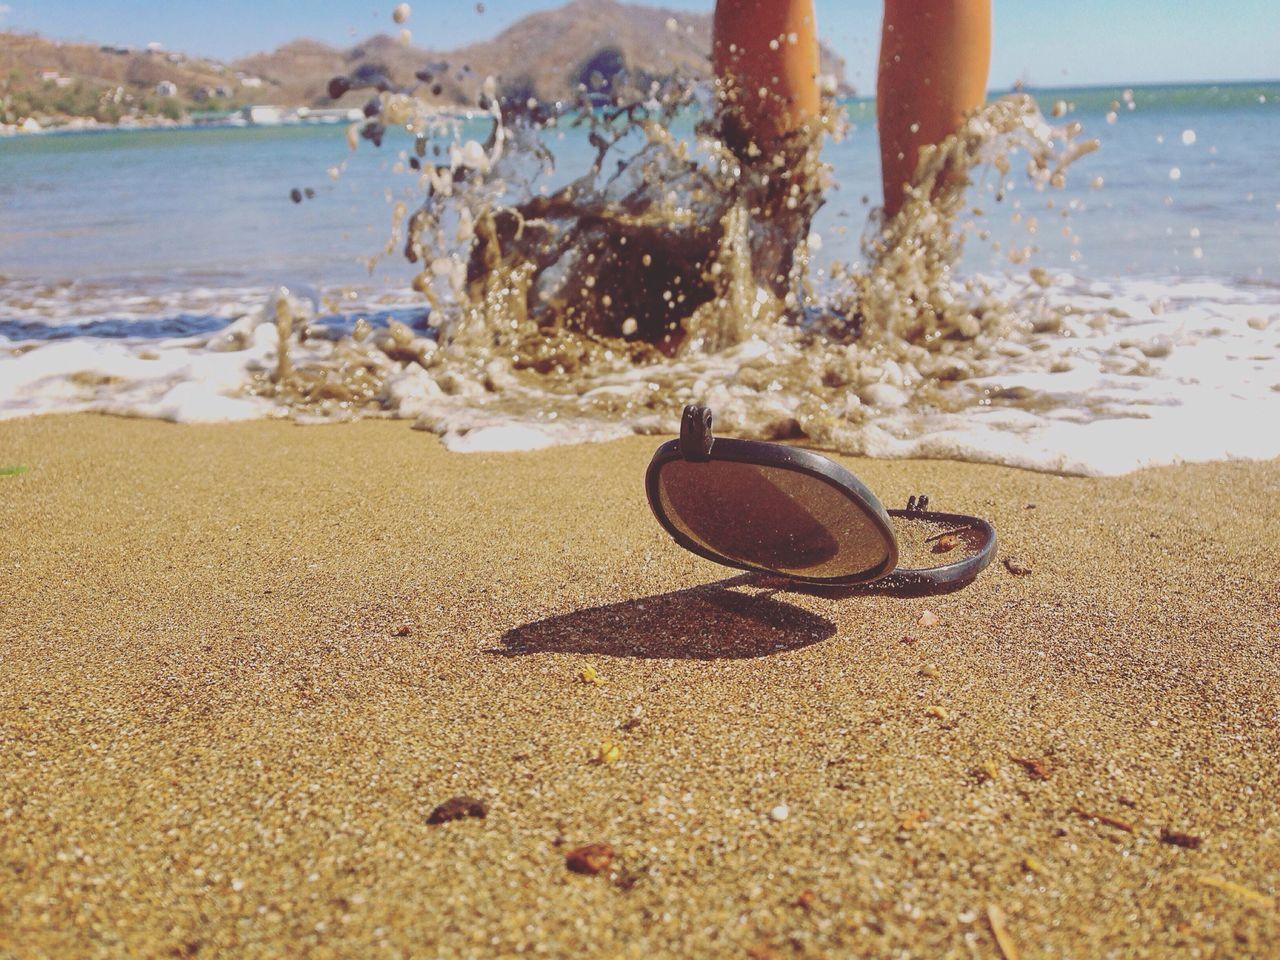 Litterati Plasticpollution Sunglass  On The Beach Splash Splashing Nicaragua San Juan Del Sur , Nicaragua